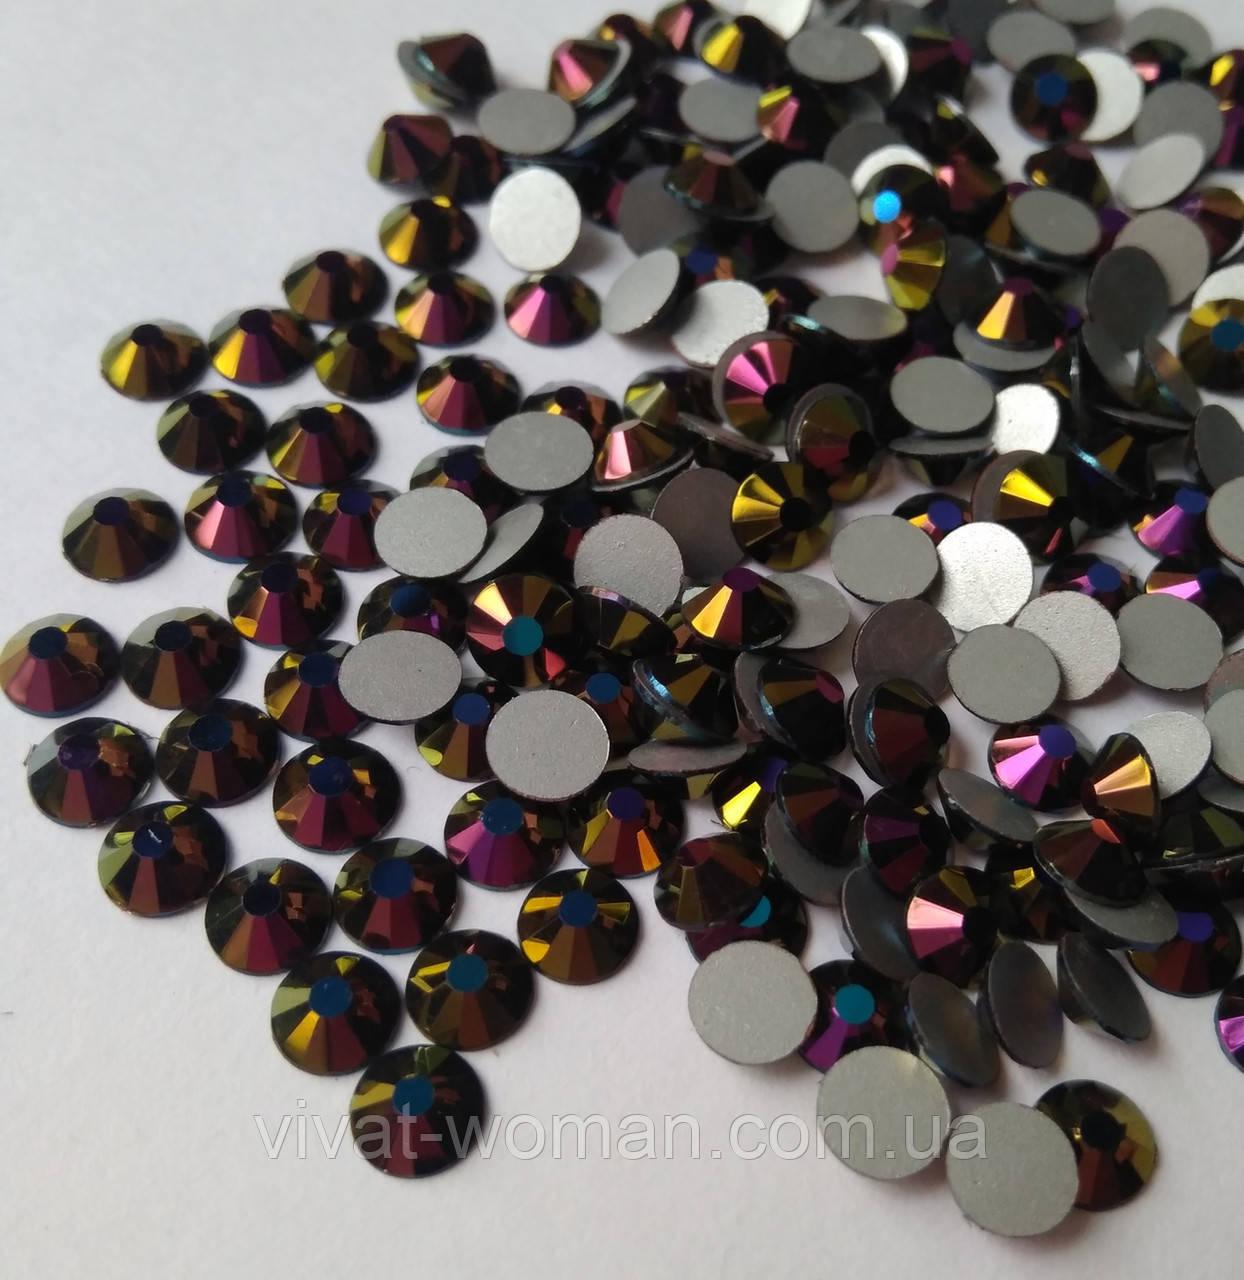 Стразы Премиум Purple Rainbow SS20 холодной фиксации. Цена за 144 шт